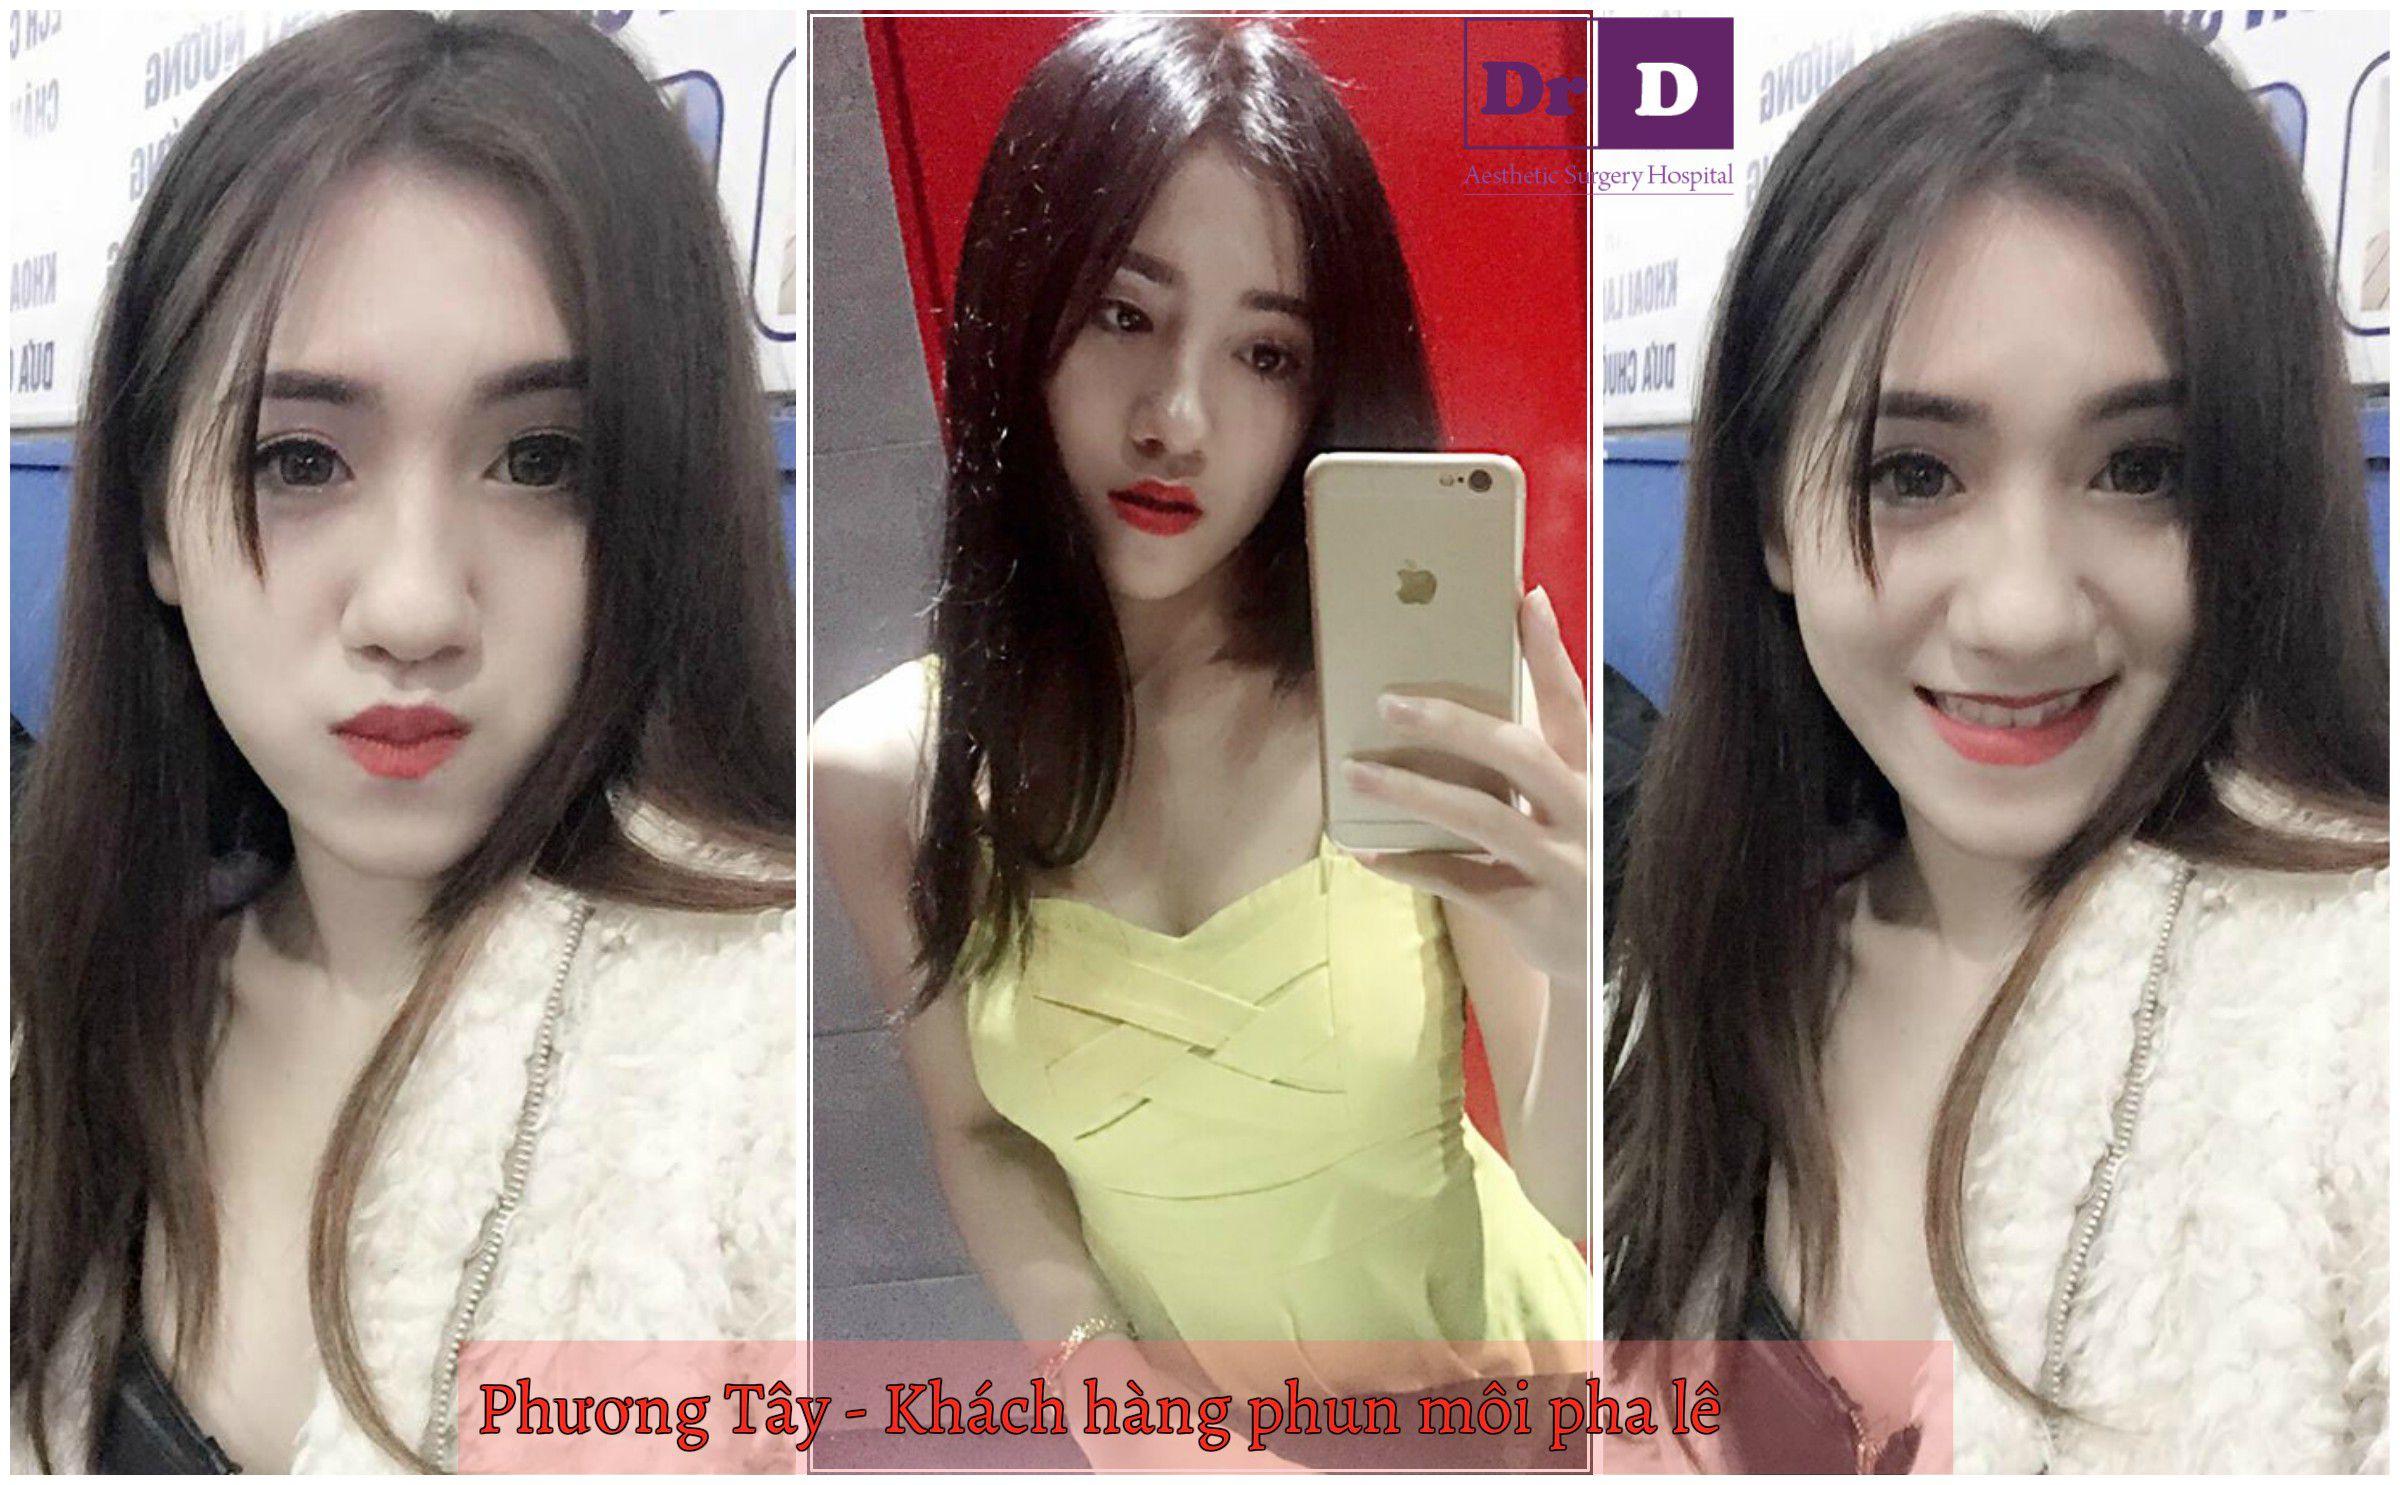 muon-selfie-dep-thi-mat-phai-dep (2) Muốn selfie đẹp thì mặt phải đẹp